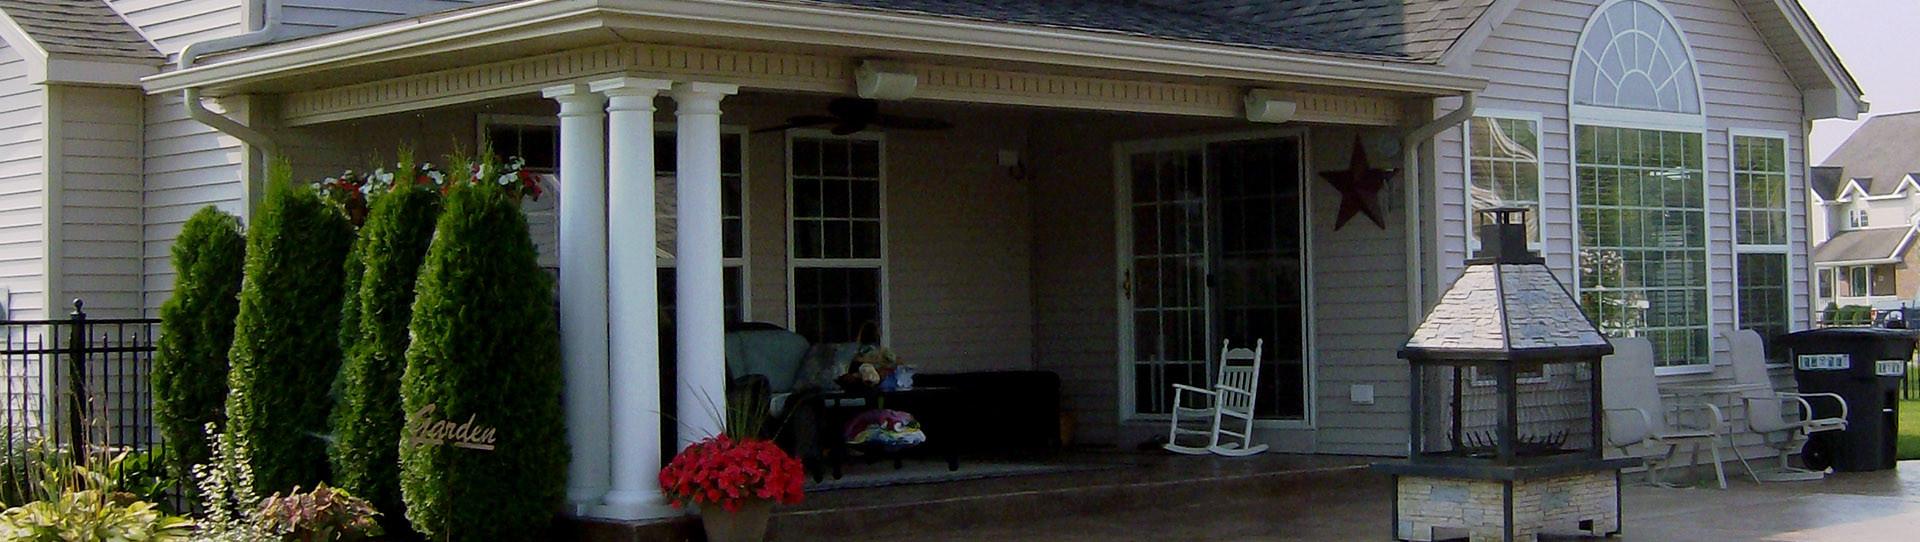 banner-bg-deck-porch